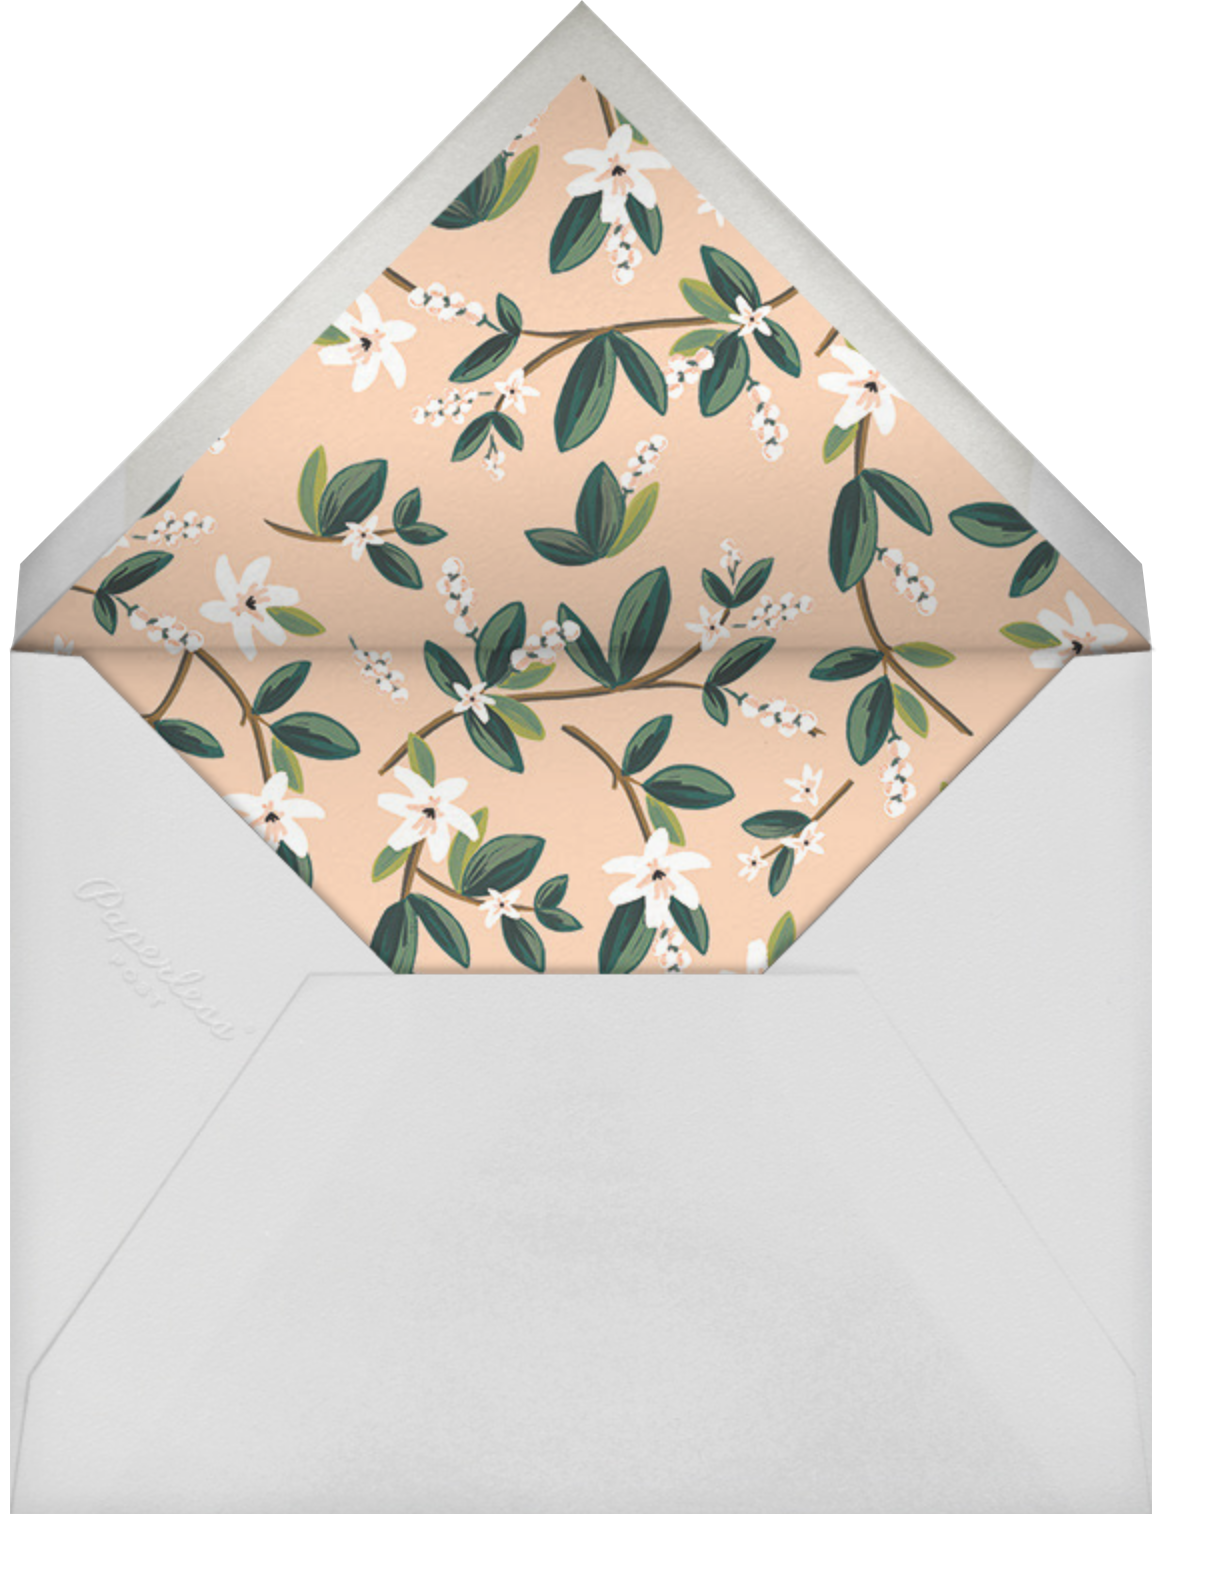 November Herbarium (Invitation) - Rifle Paper Co. - Virtual wedding - envelope back